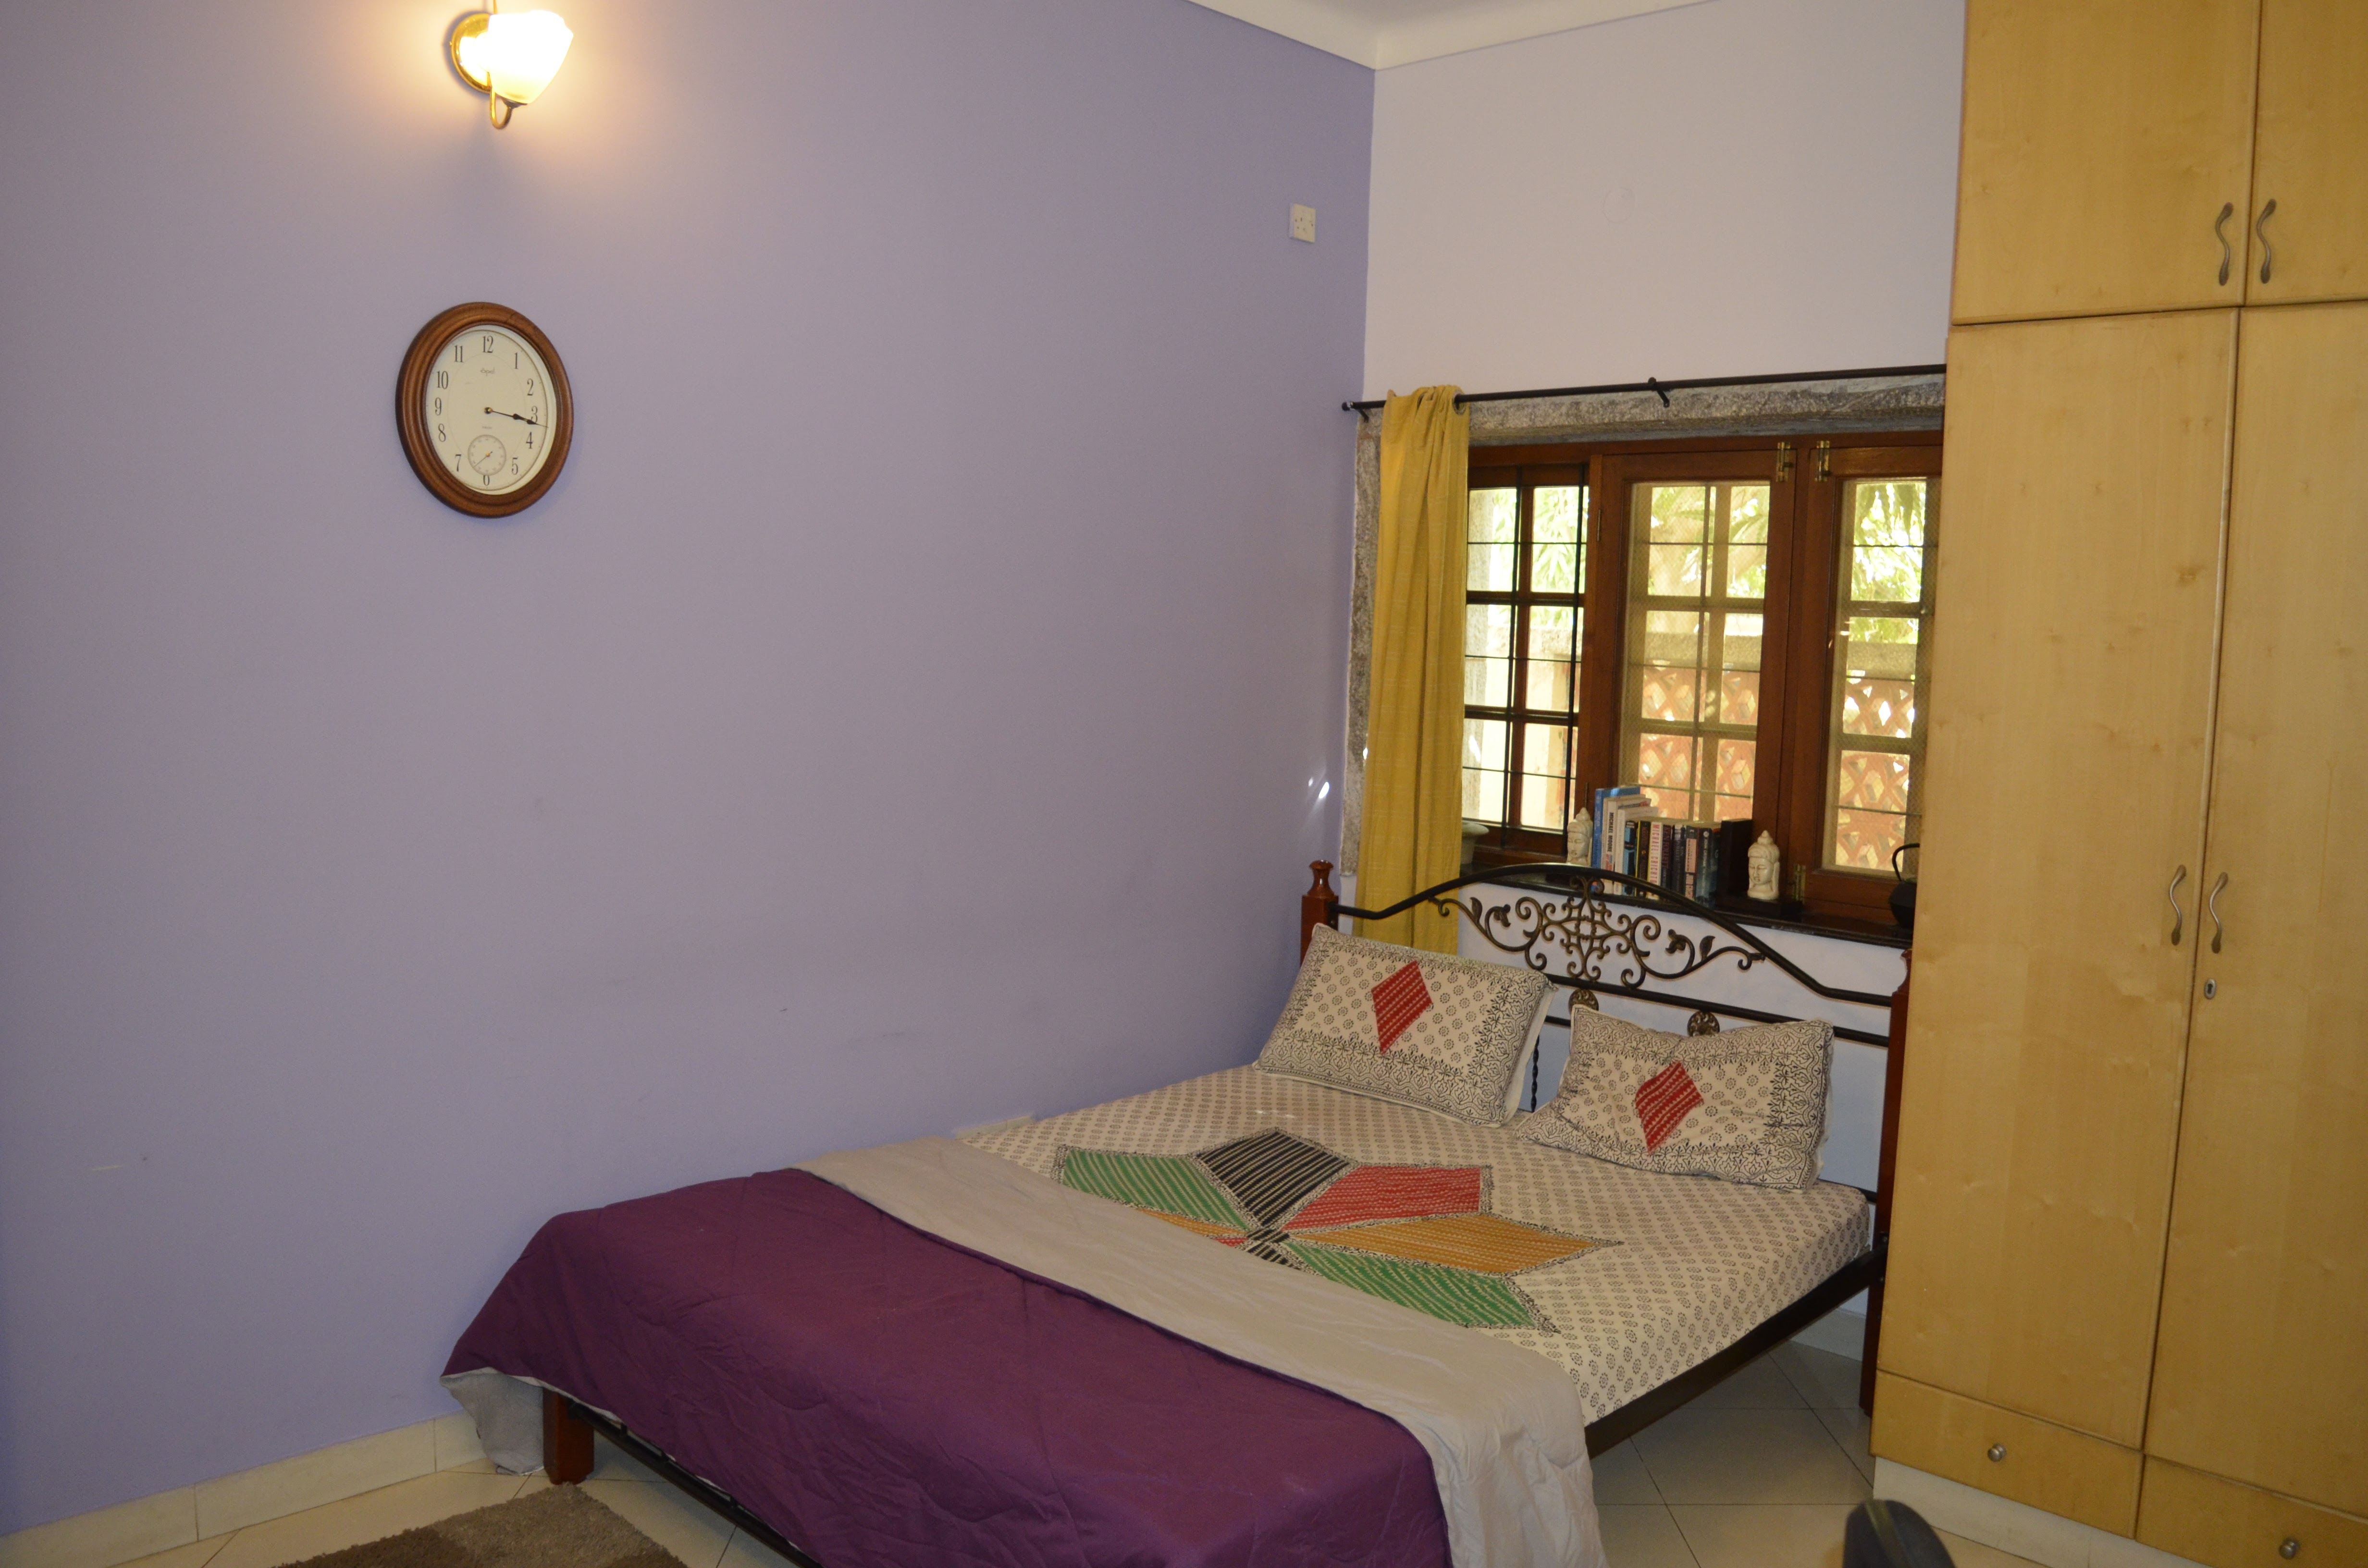 Casabianca - Your Room